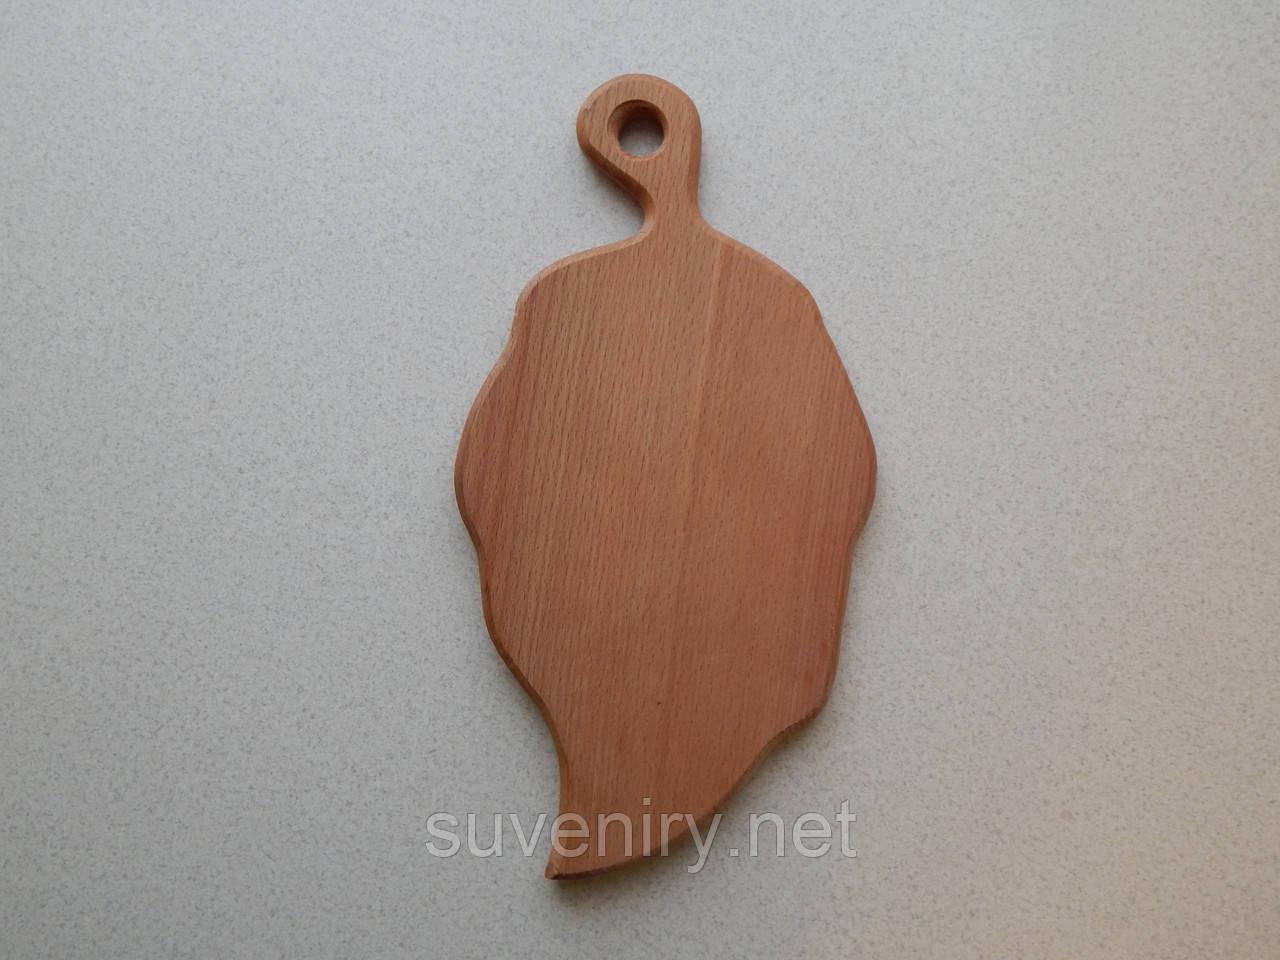 Кухонная доска лепесток 25*15